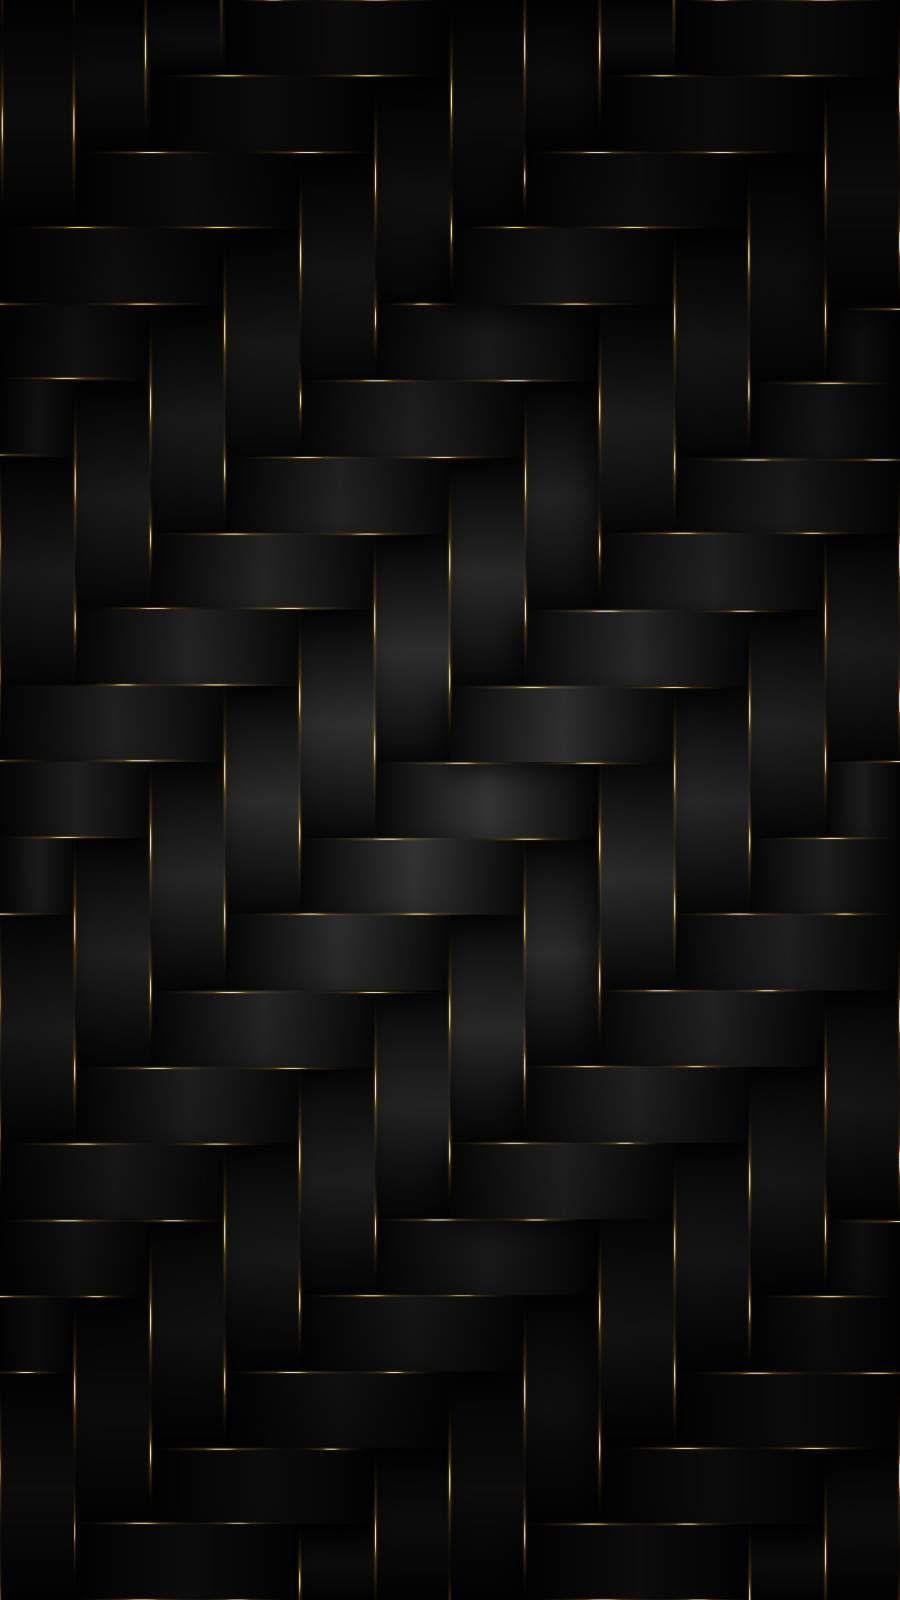 Carbon Fiber Pattern Iphone Wallpaper Phone Wallpaper Design Iphone Wallpaper Photos Iphone Wallpaper